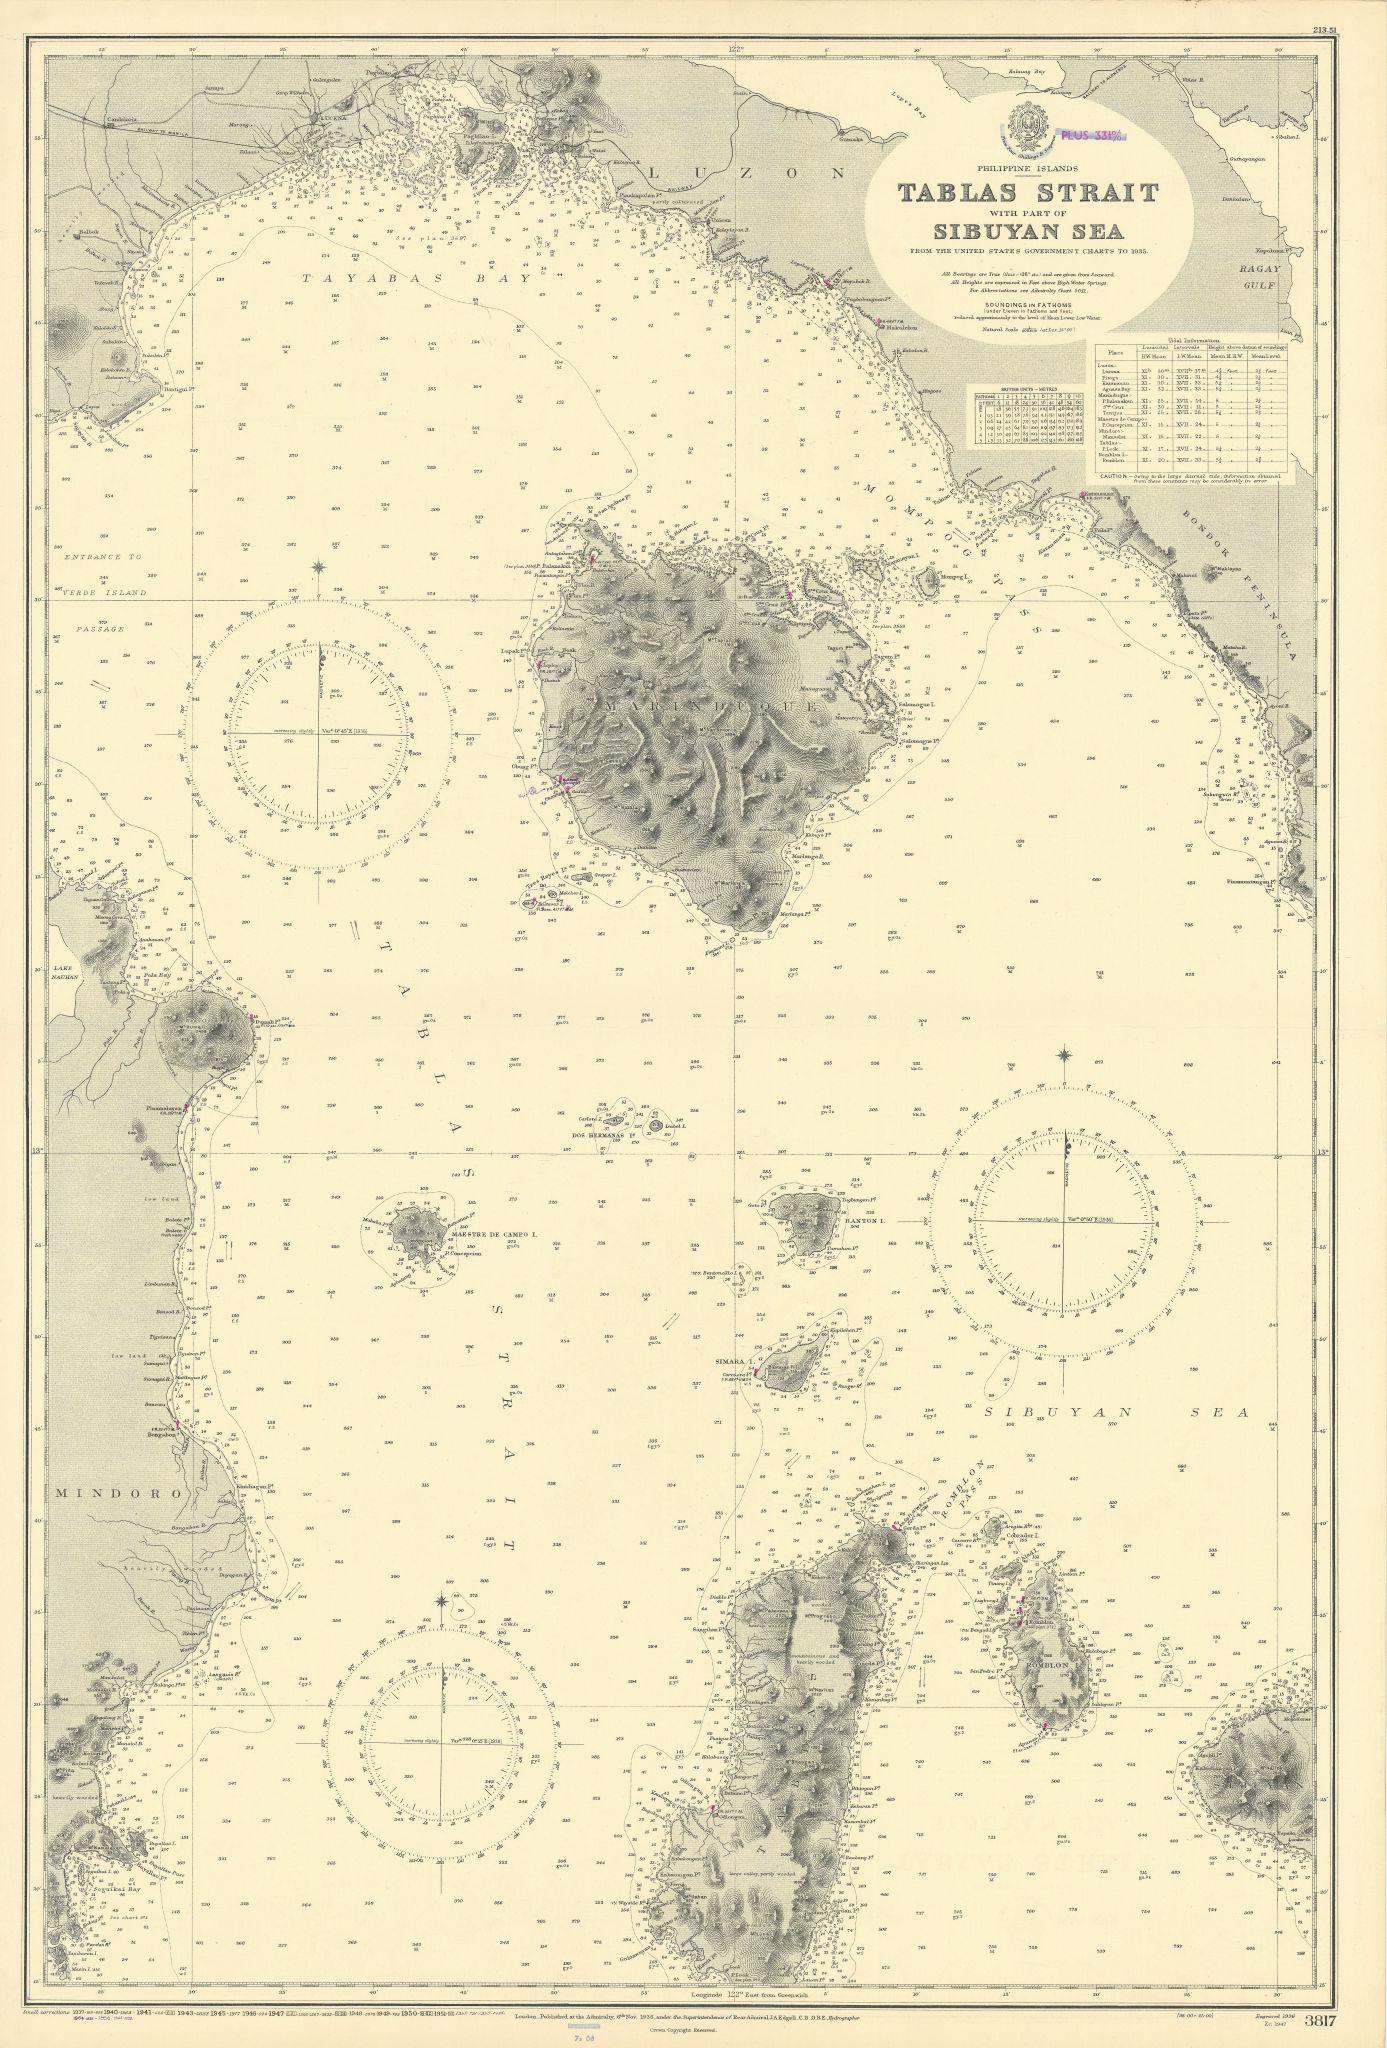 Philippines Tablas Luzon Mindoro Marinduque ADMIRALTY chart 1936 (1956) map